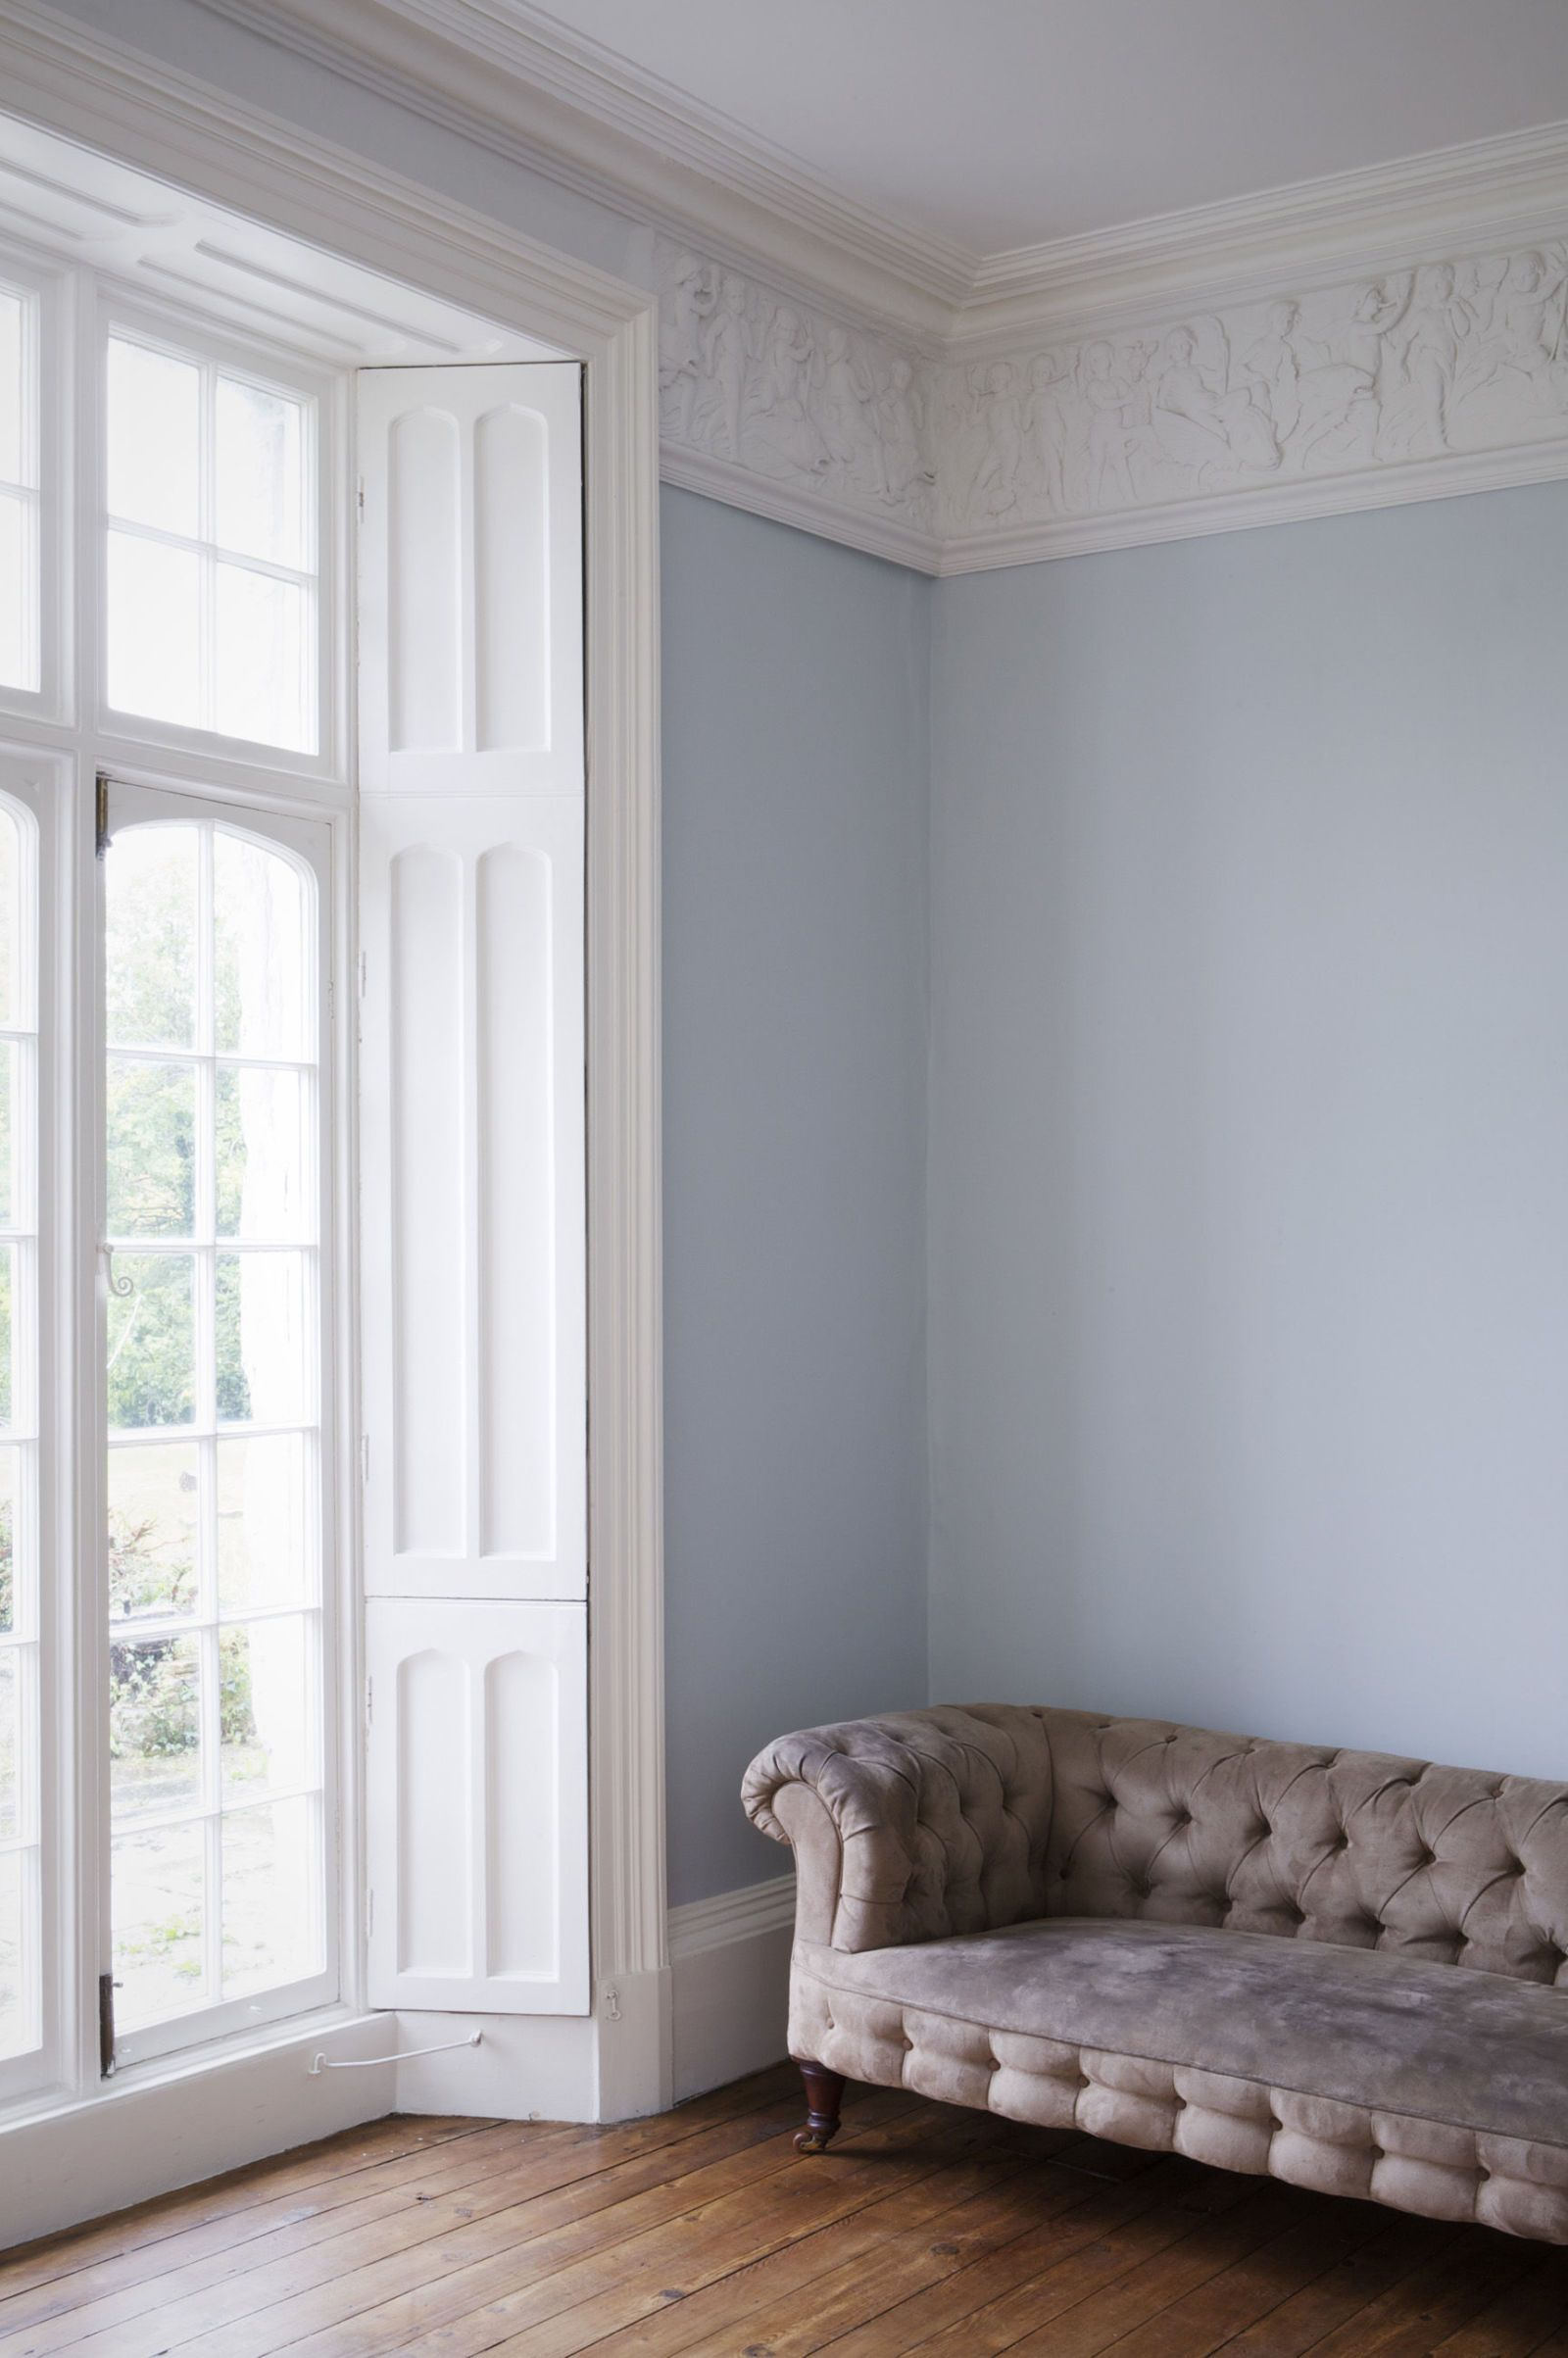 Best Calming Paint Shades That Help Reduce Stress Farrow 400 x 300